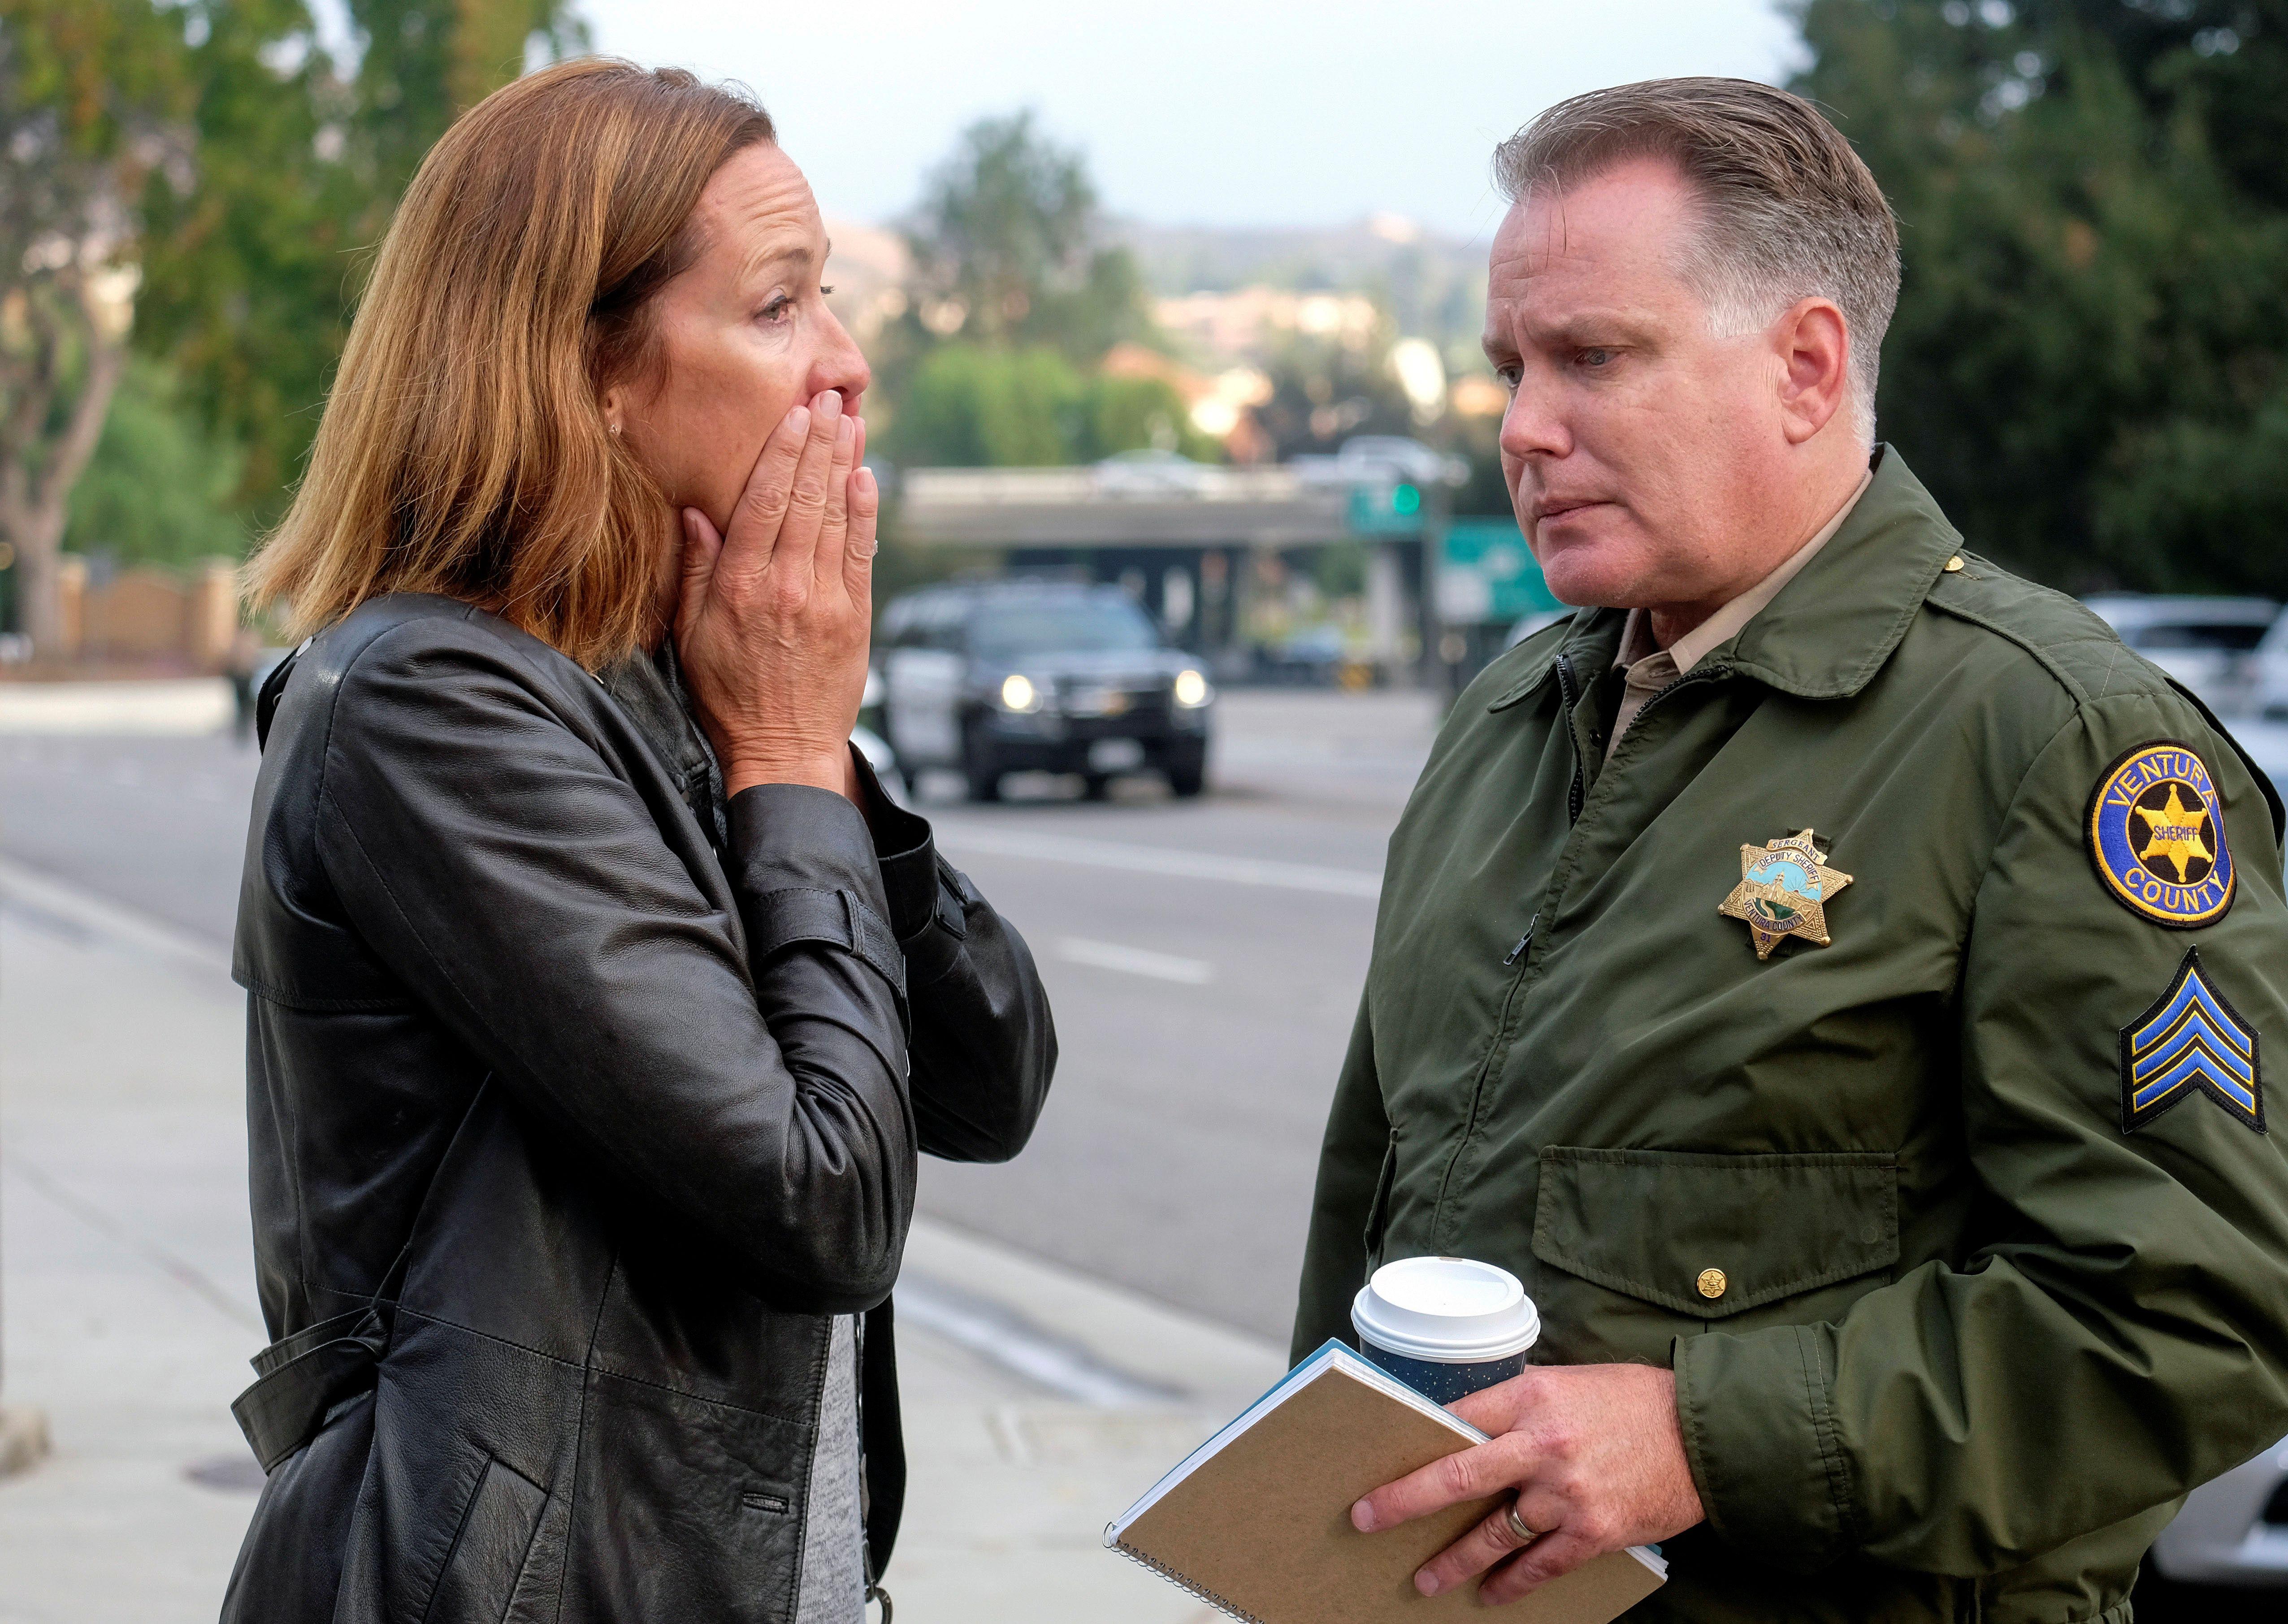 By Alex Dobuzinskis Thousand Oaks Calif Reuters A Former U S Marine Combat Veteran Opened Fire In A Los Angeles Area Bar An Trump You Thousand Oaks Marine